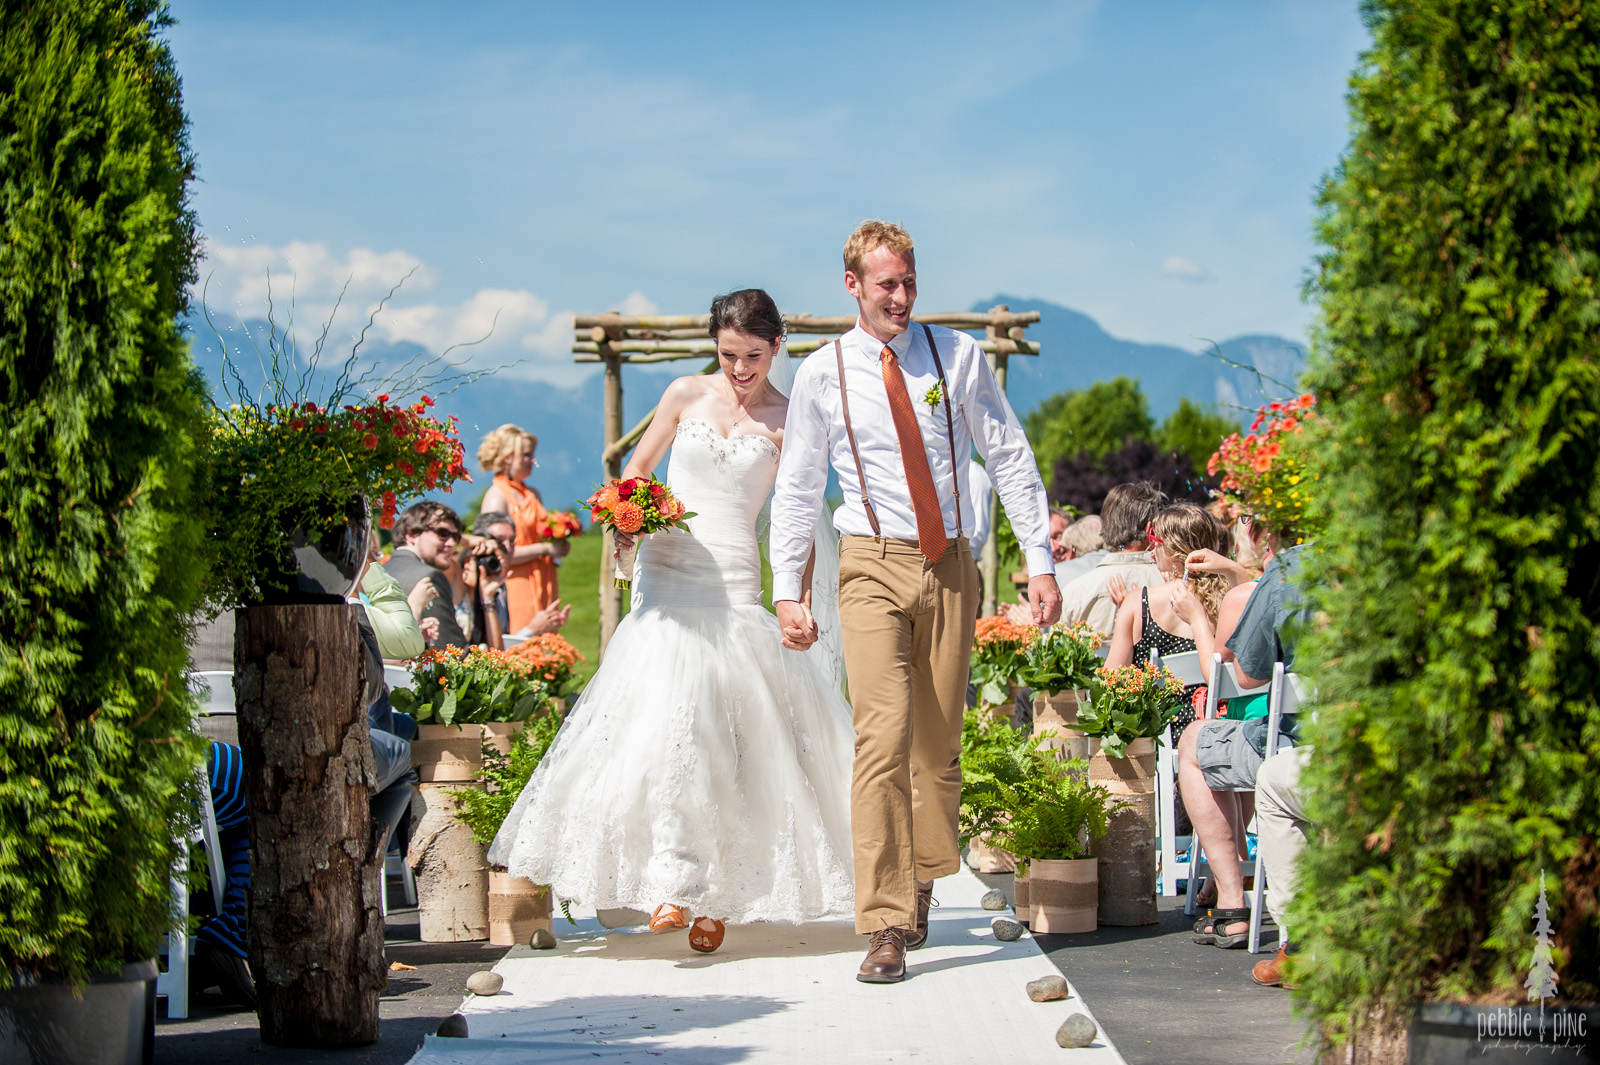 vancouver-island-wedding-photographers-golden-eagle-golf-course-wedding-mountaintop-wedding-24.jpg